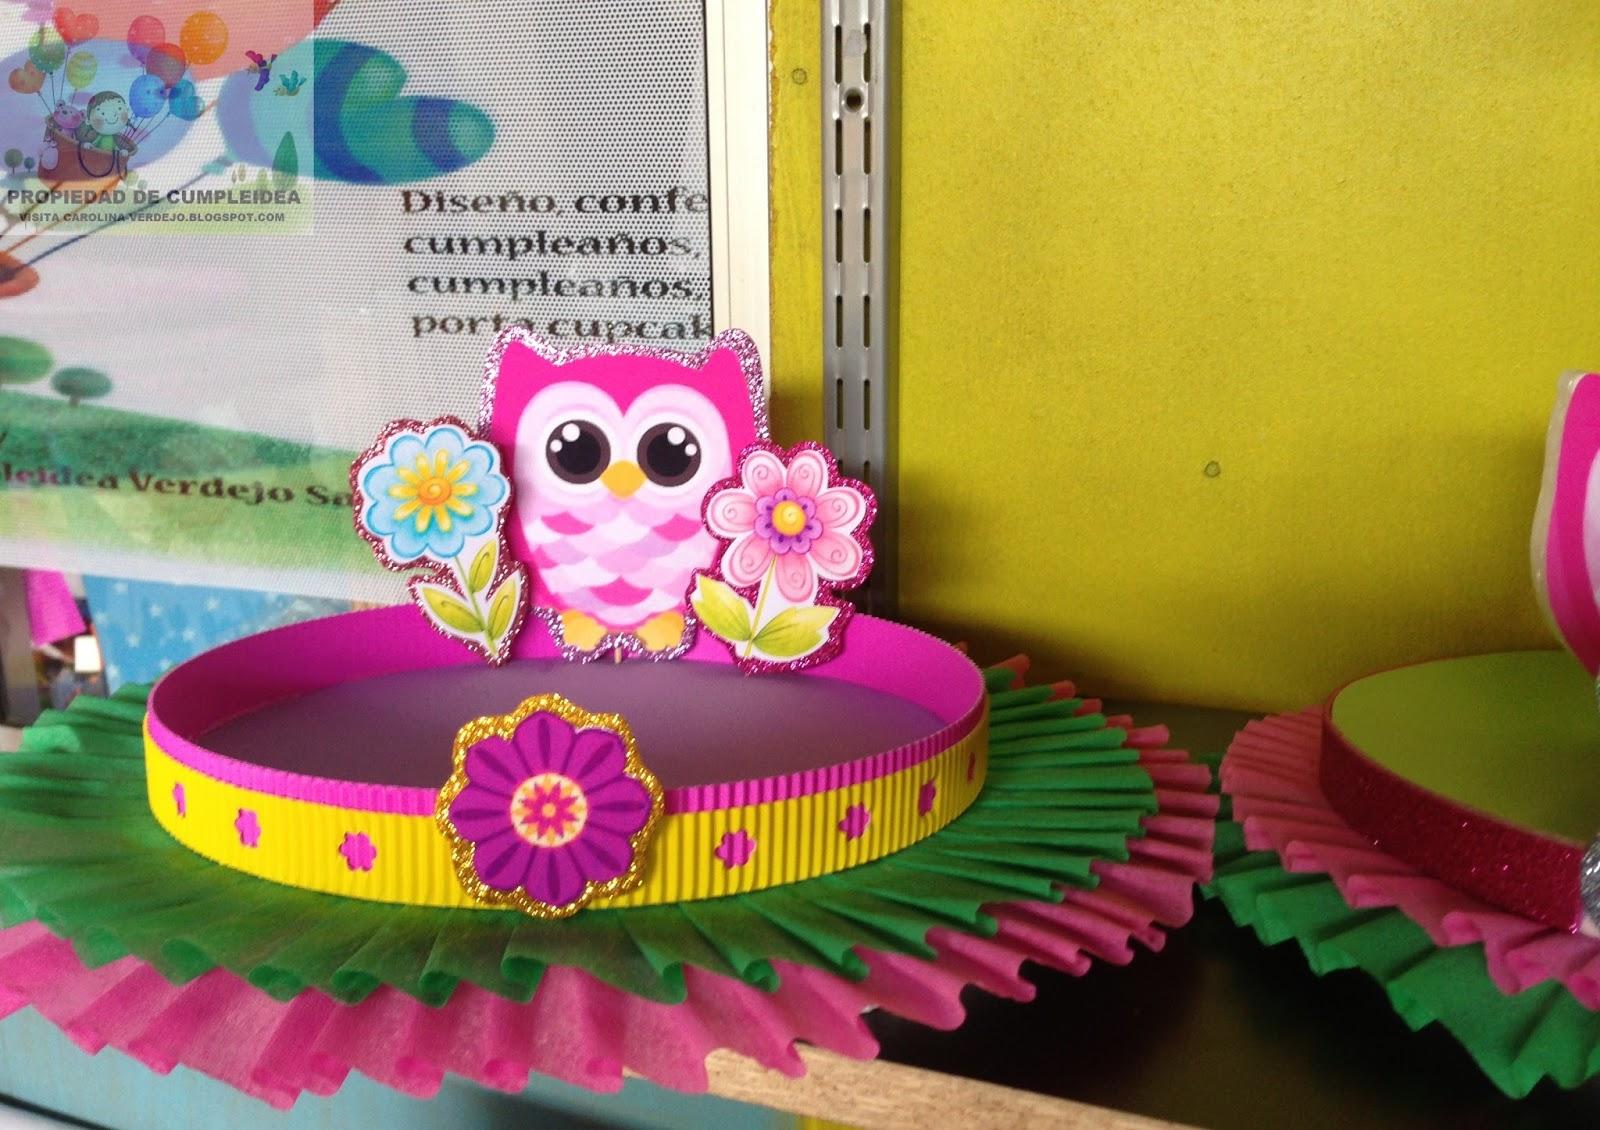 Decoraciones infantiles tematica de lechuzas - Decoracion goma eva infantil ...